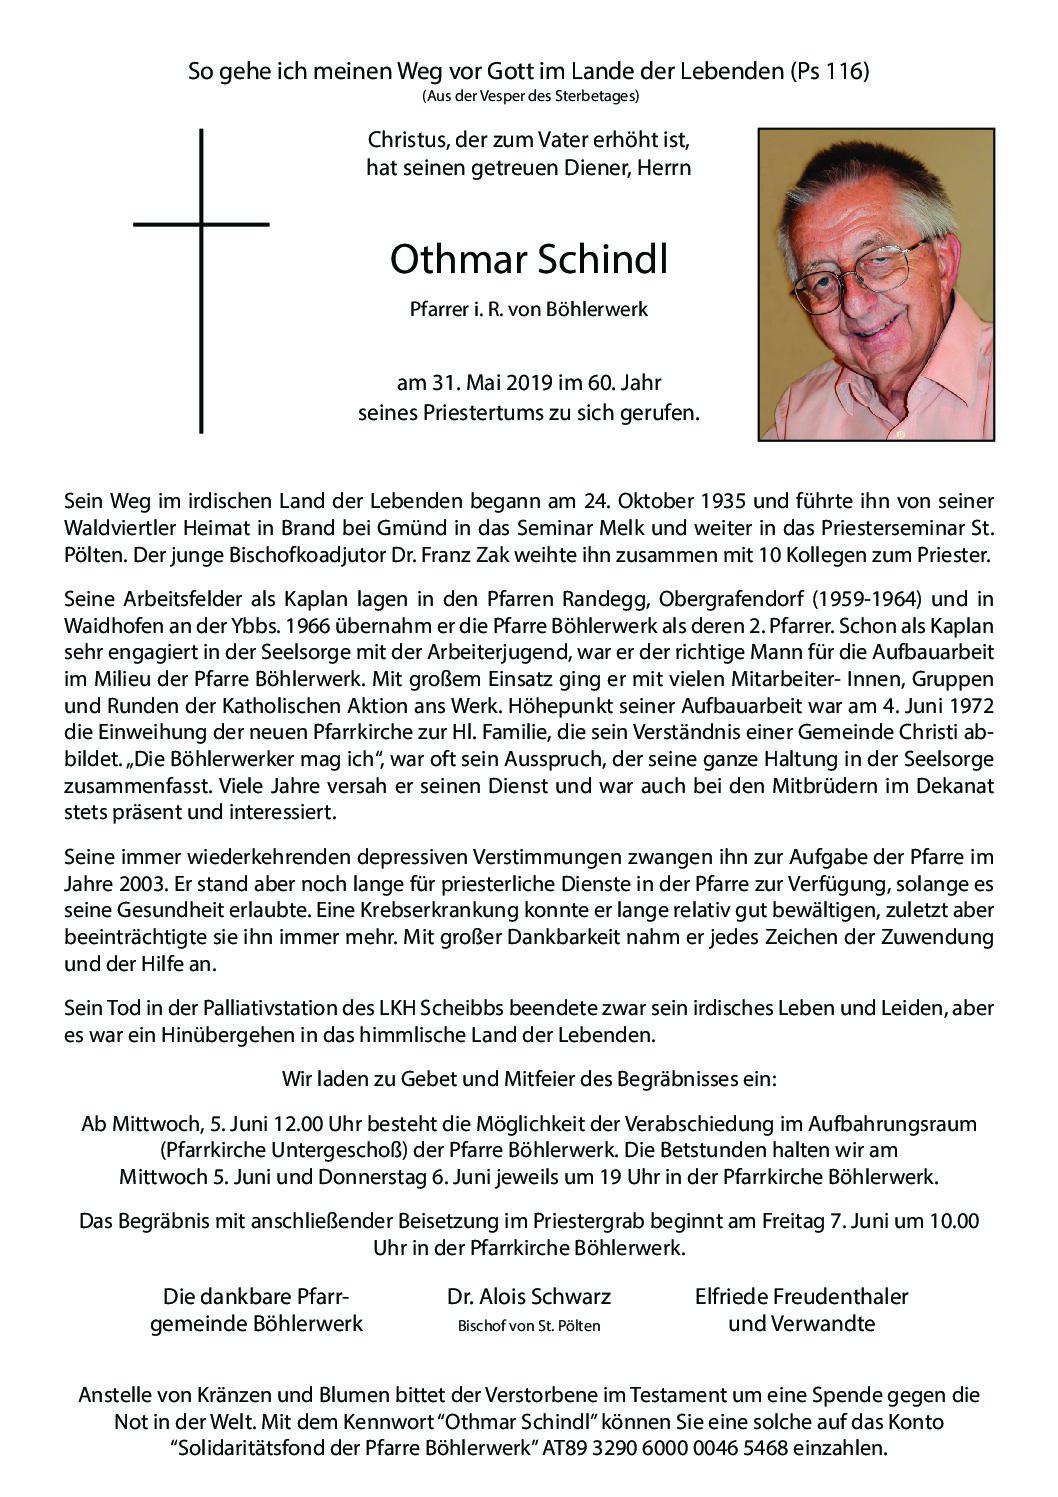 Othmar Schindl